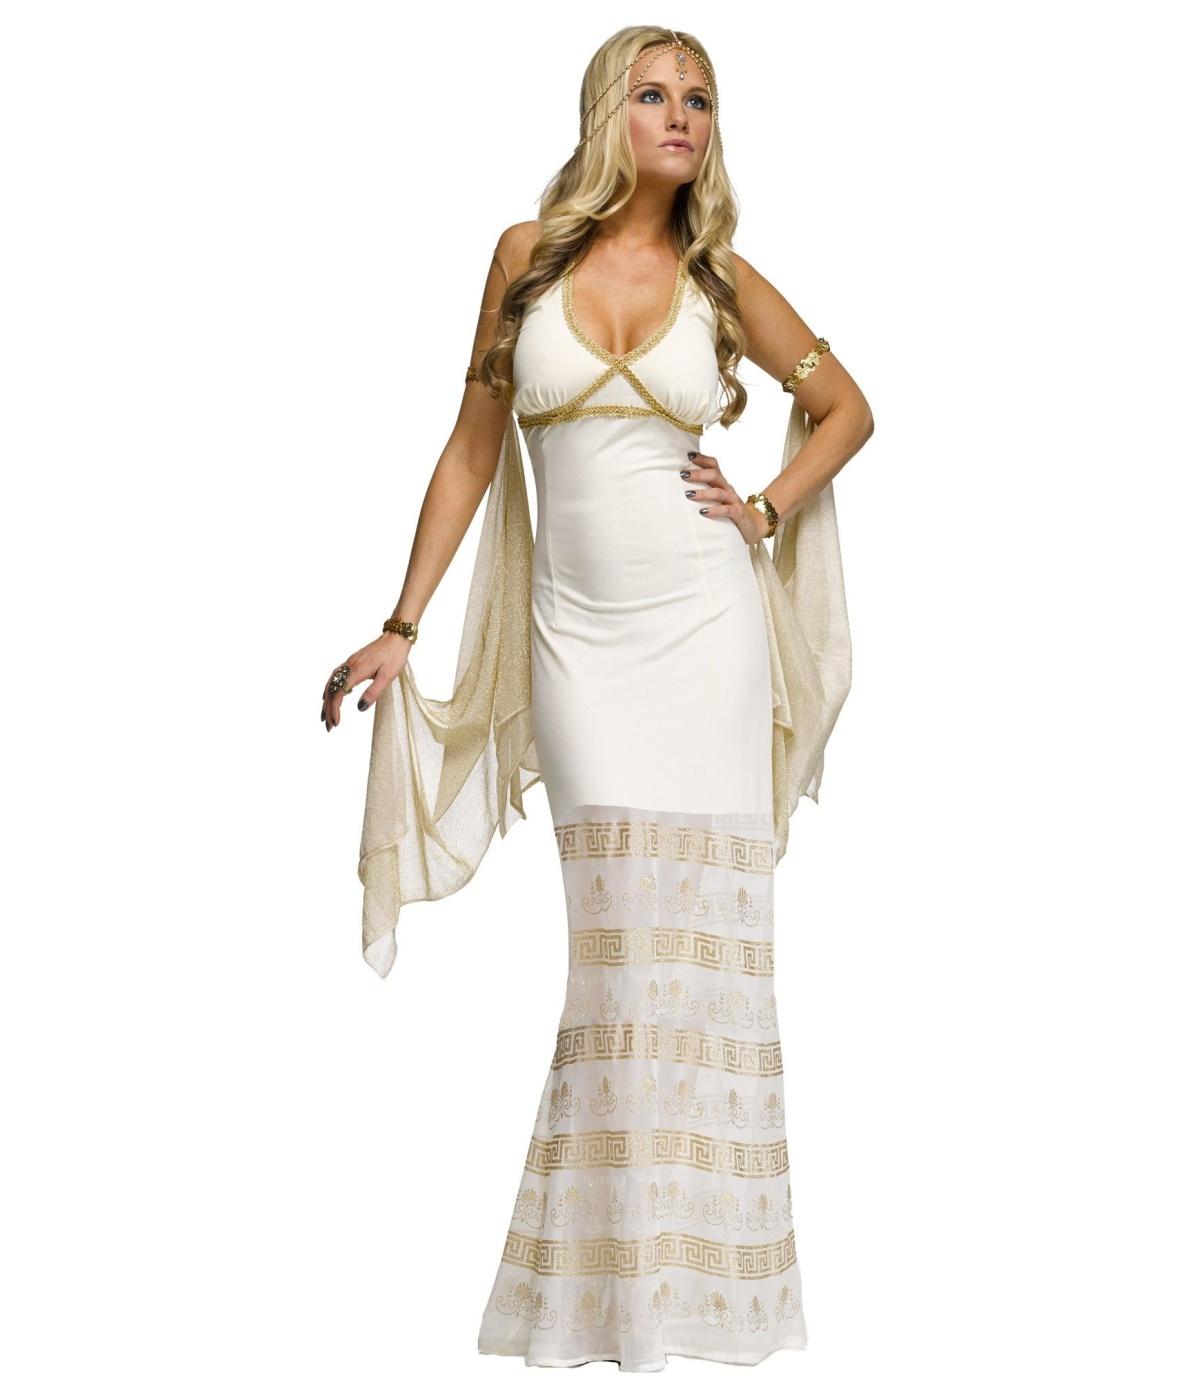 book of greece women dress in singapore by olivia u2013 playzoa com